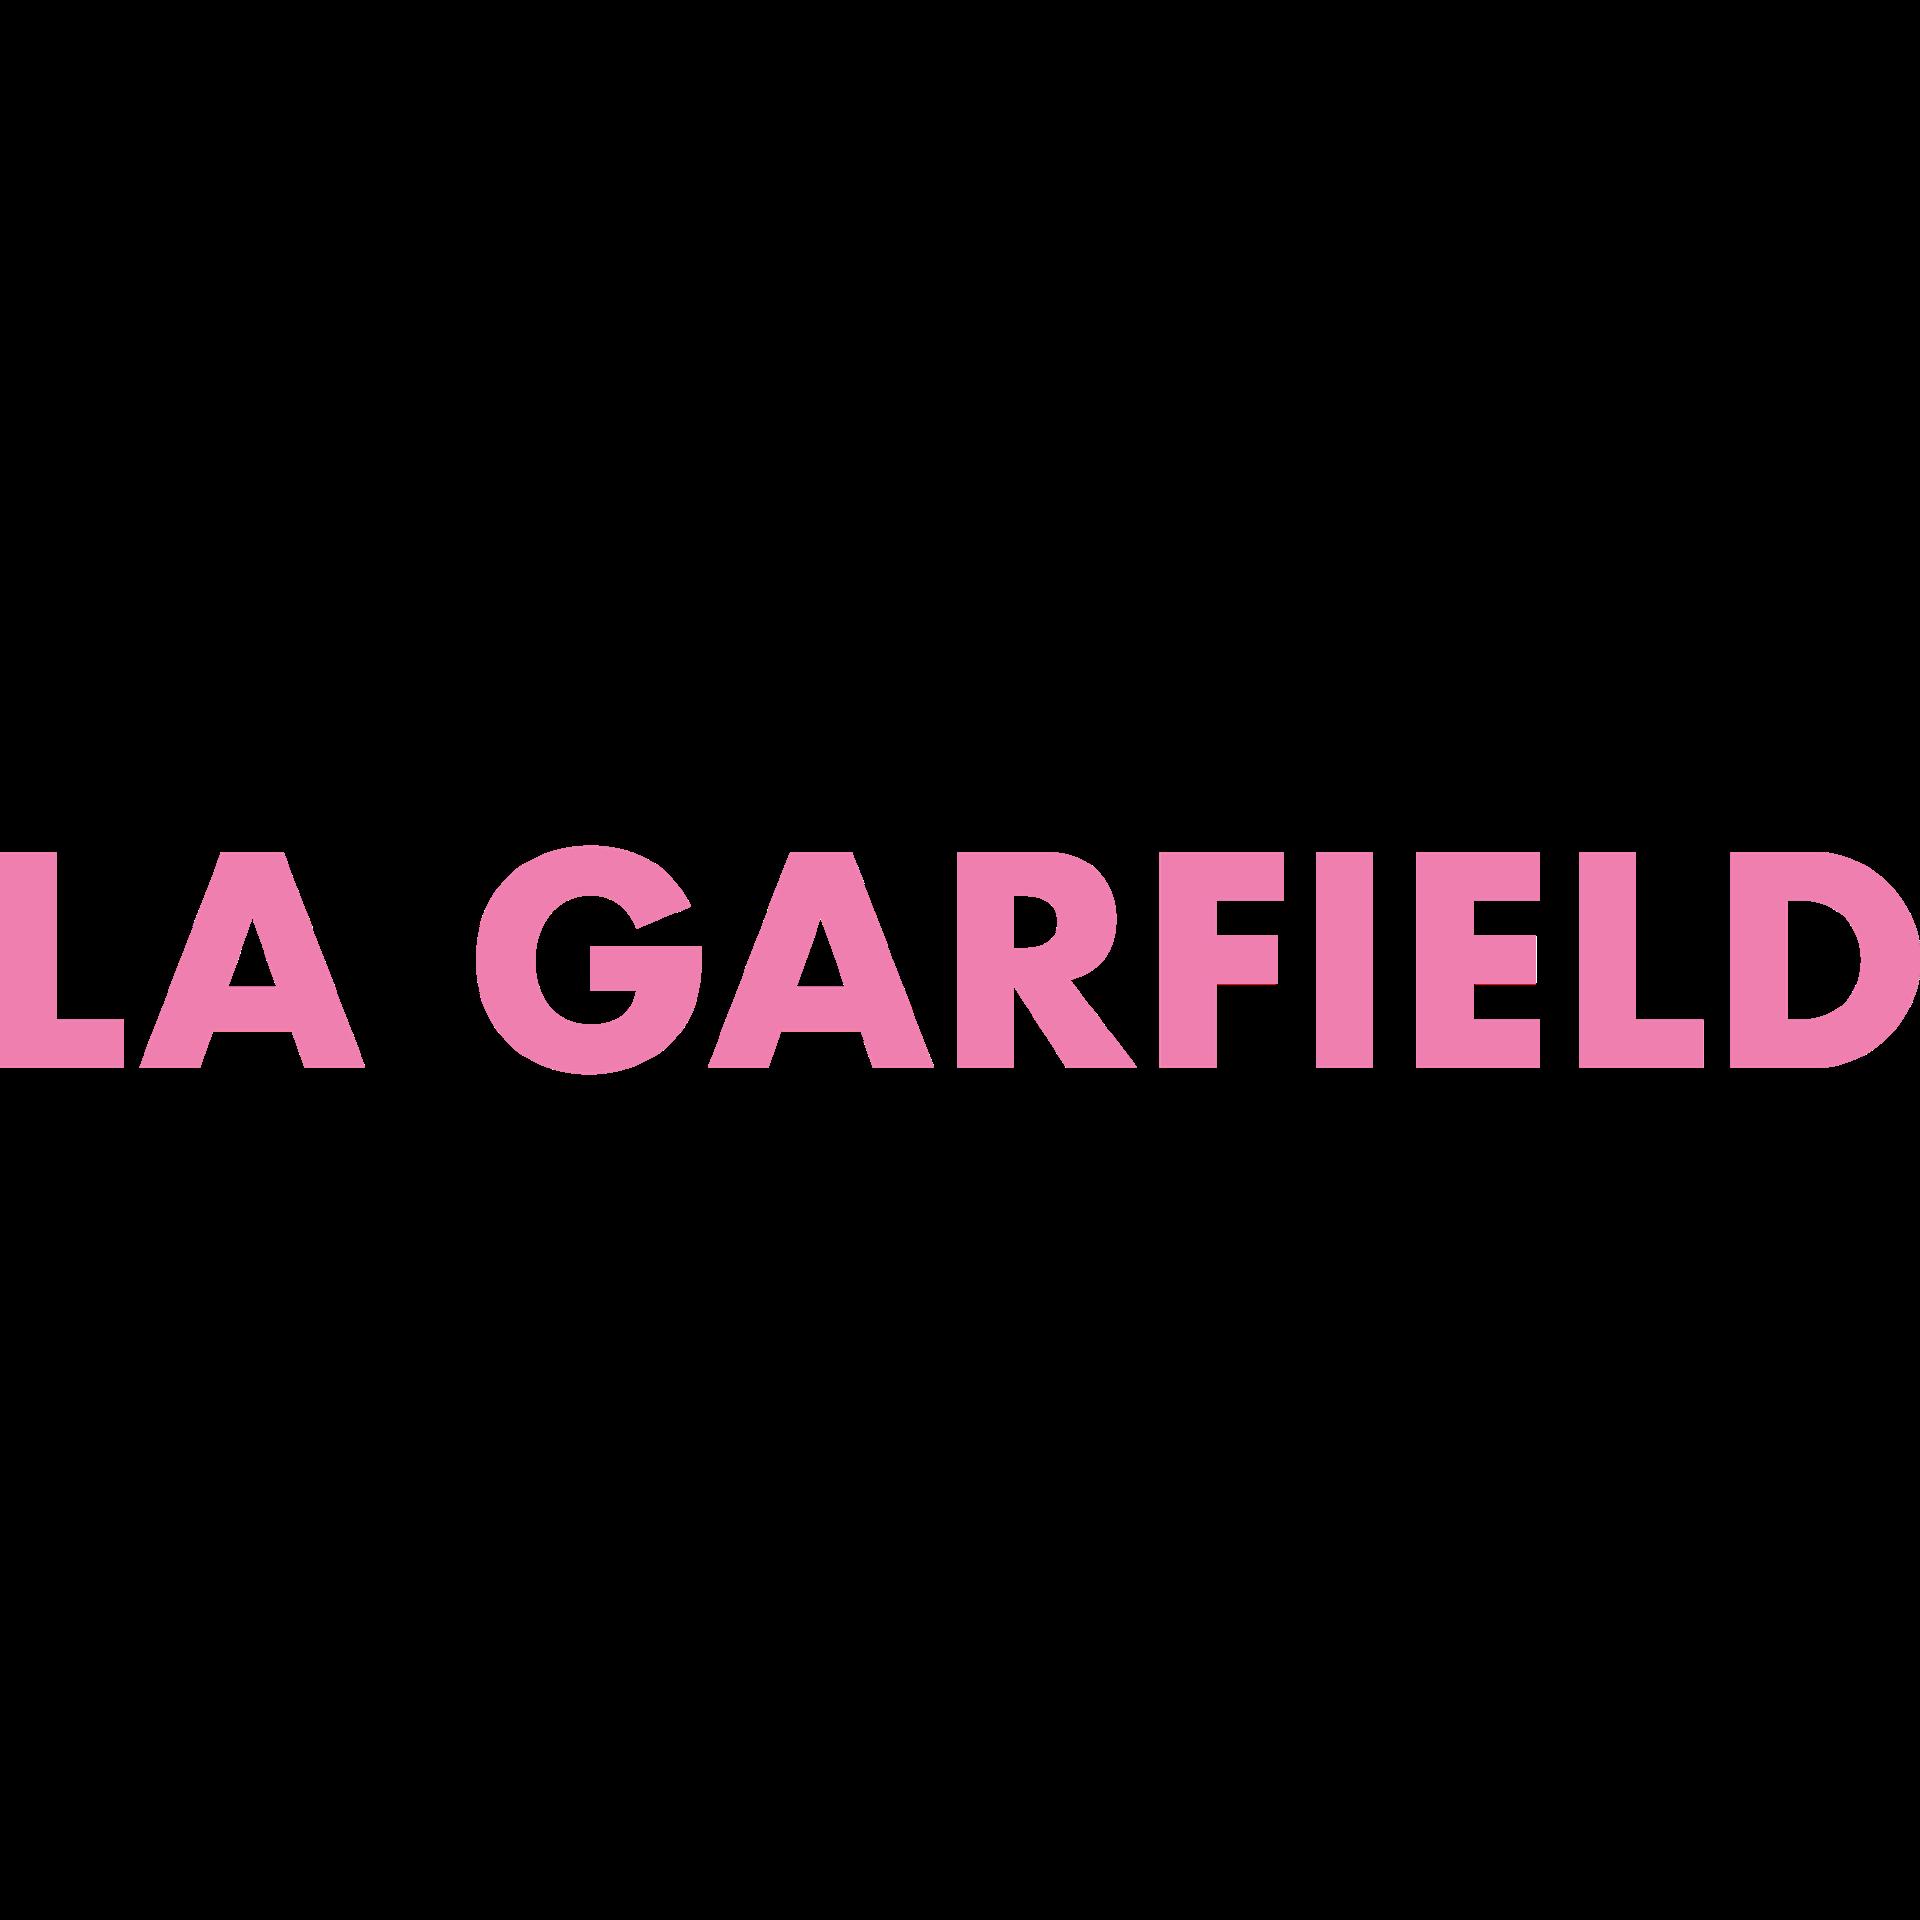 LAGARFIELD